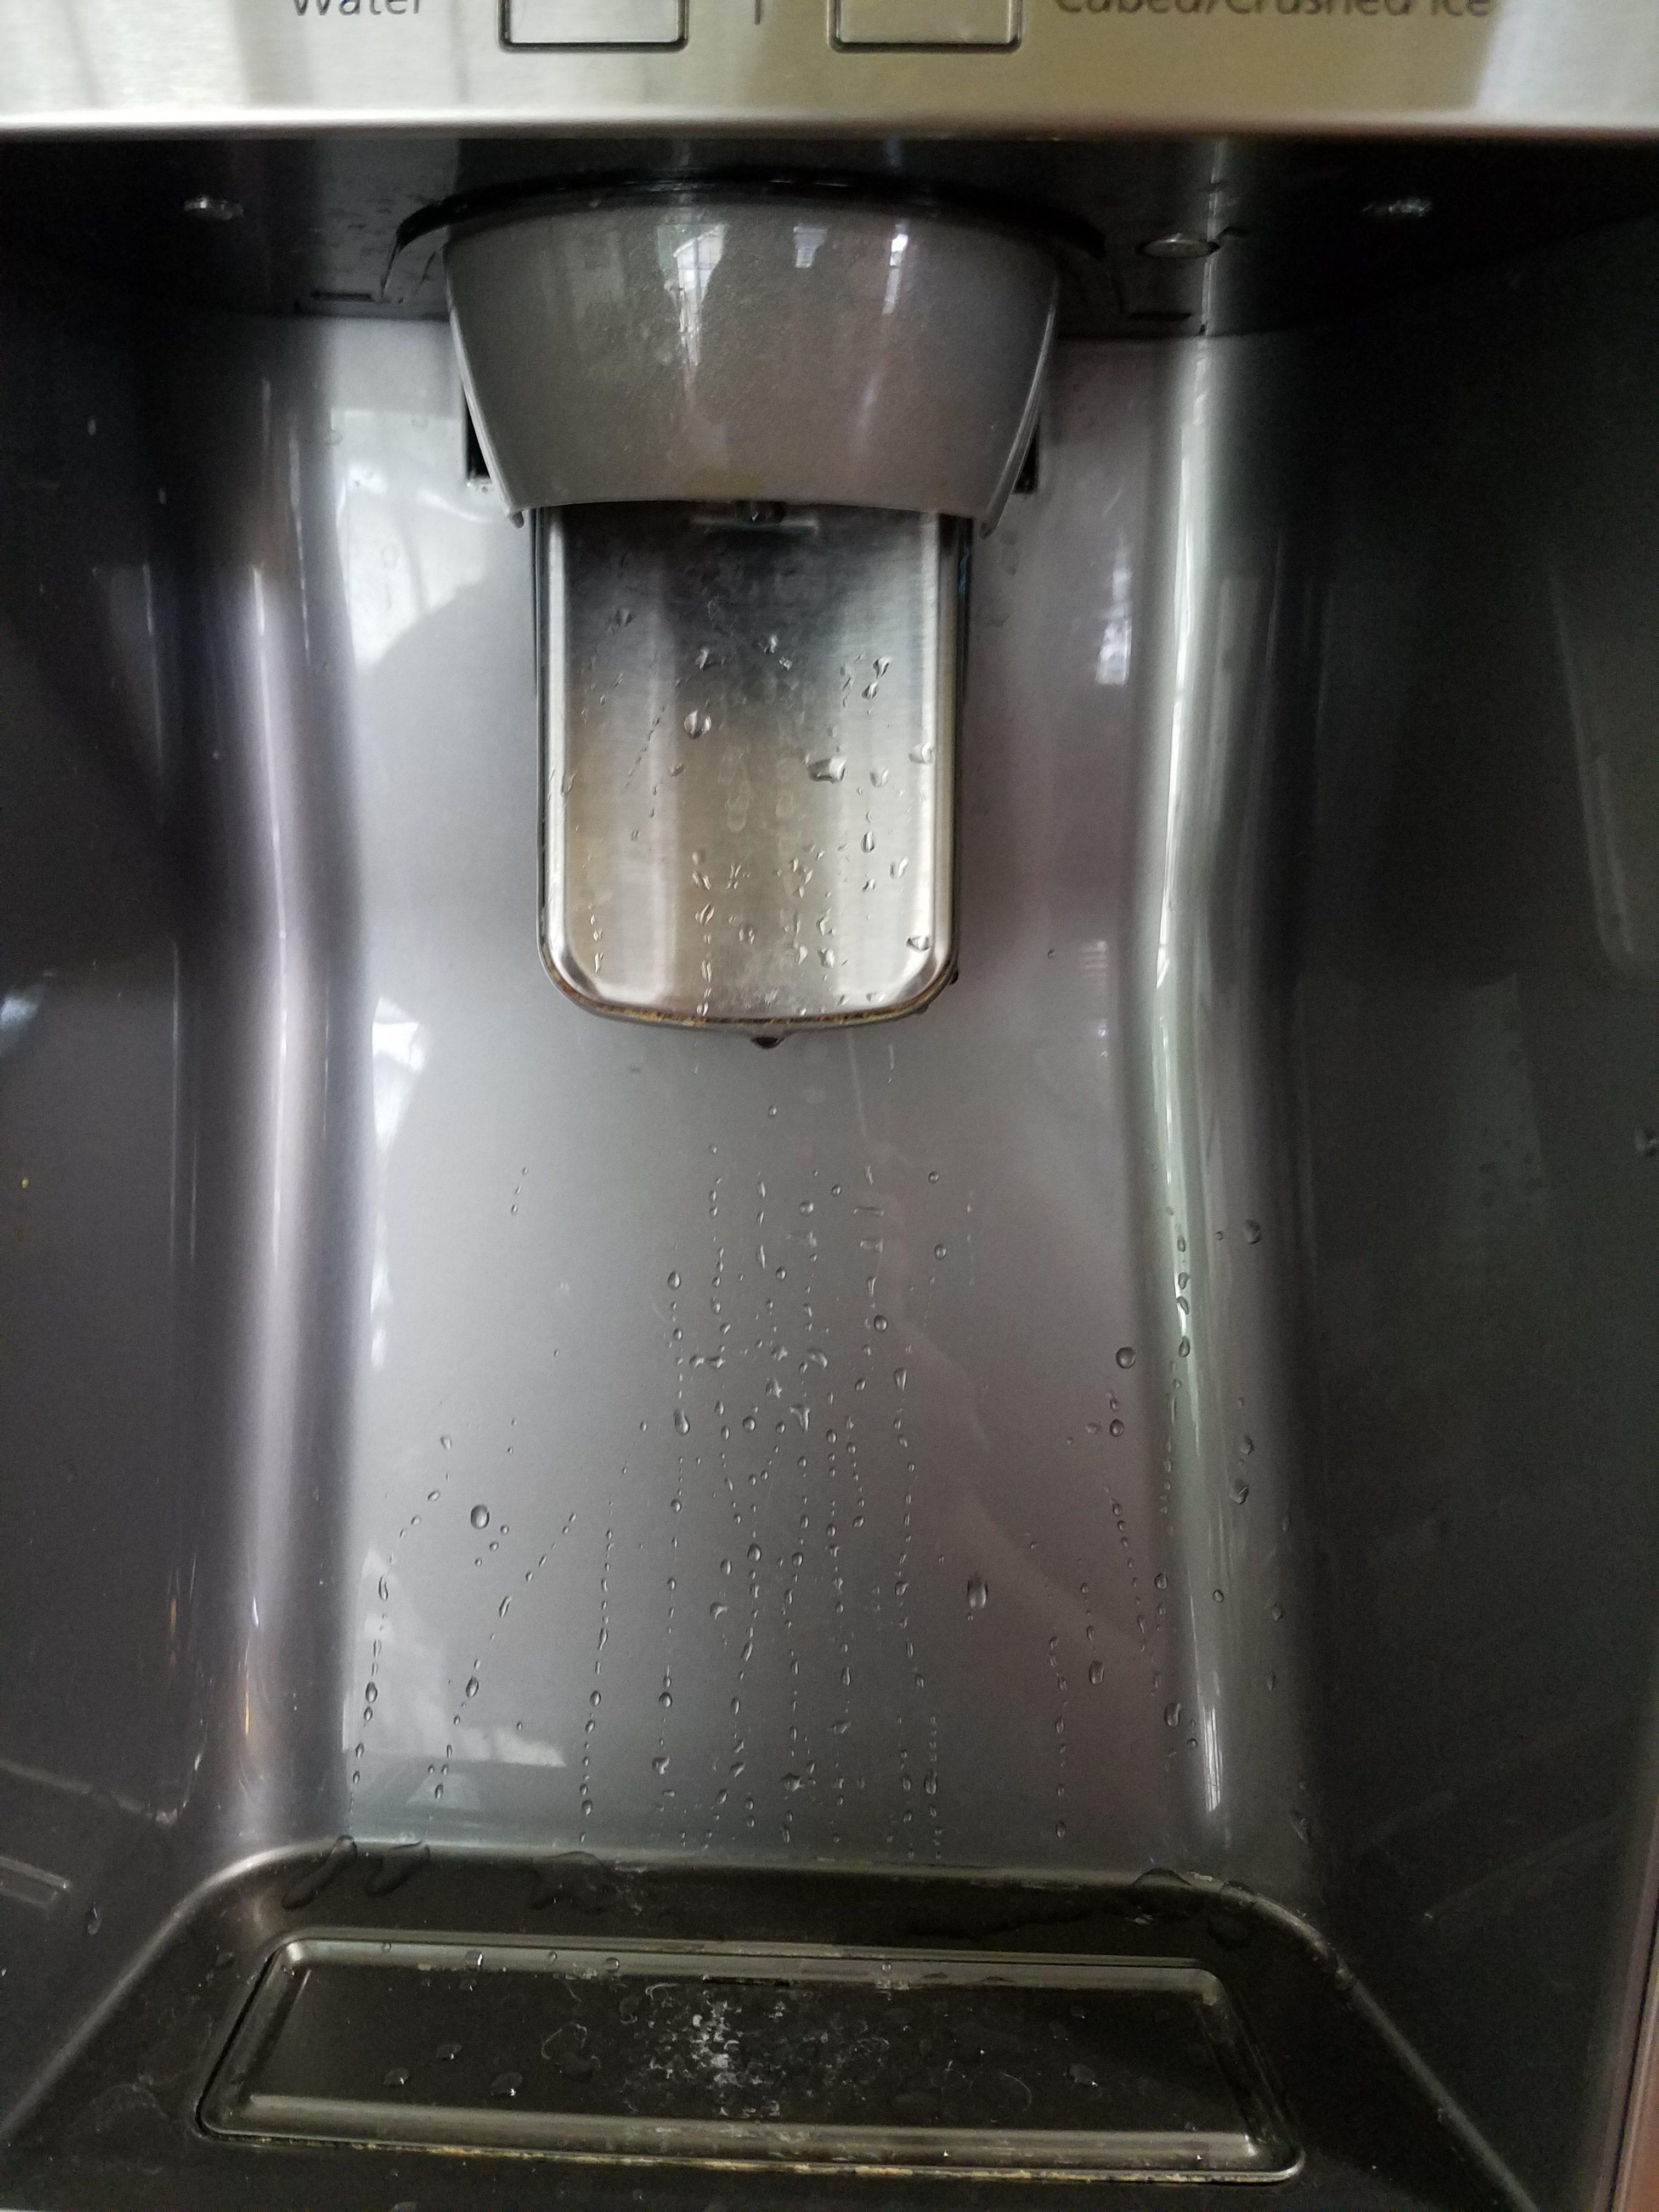 Cincinnati Refrigerator Repair Top 2532 Reviews And Complaints About Samsung Refrigerator